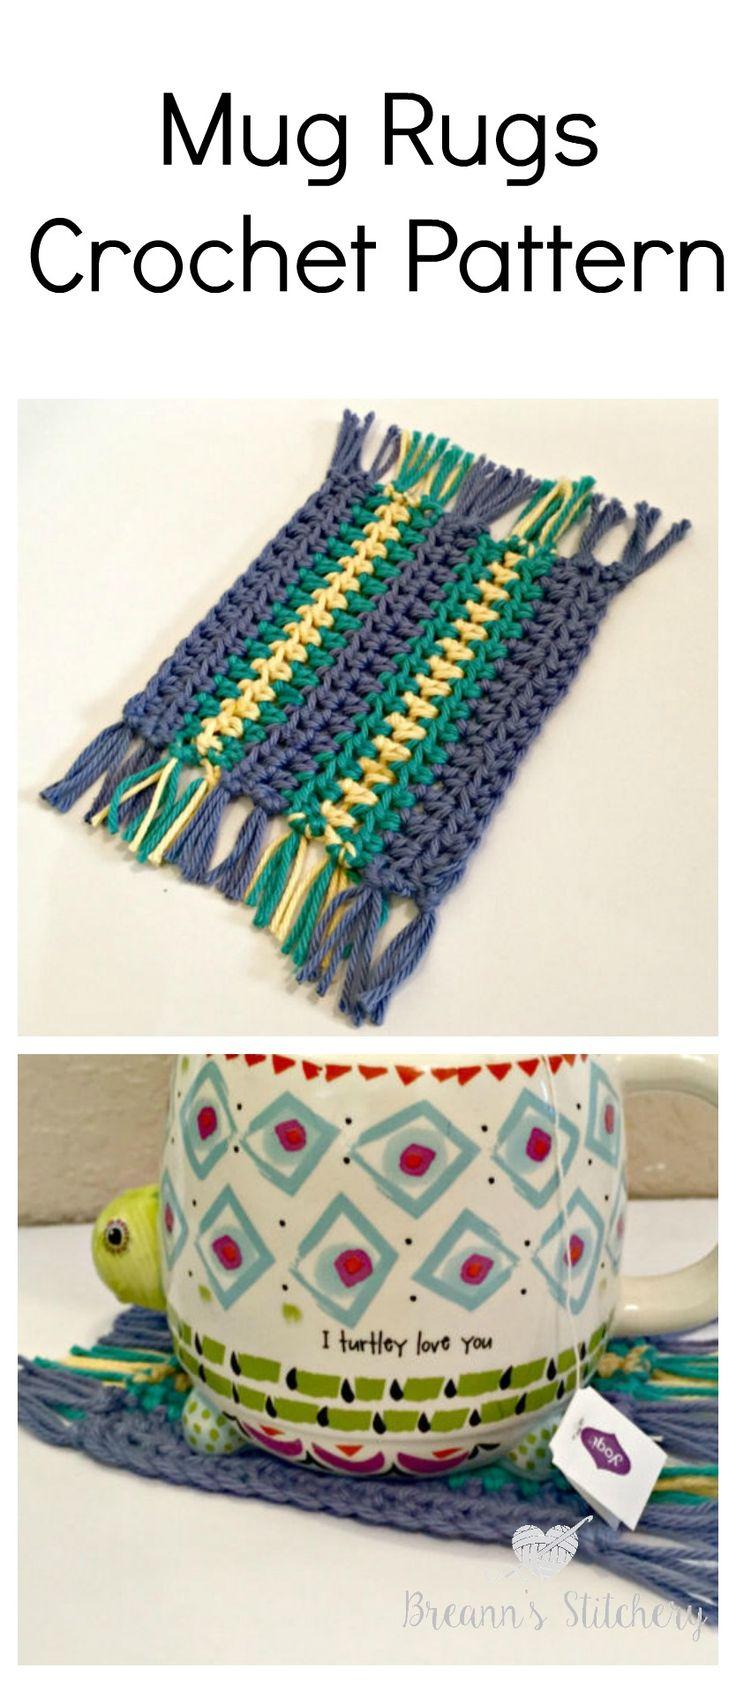 Mug Rugs Crochet Pattern – Breann's Stitchery